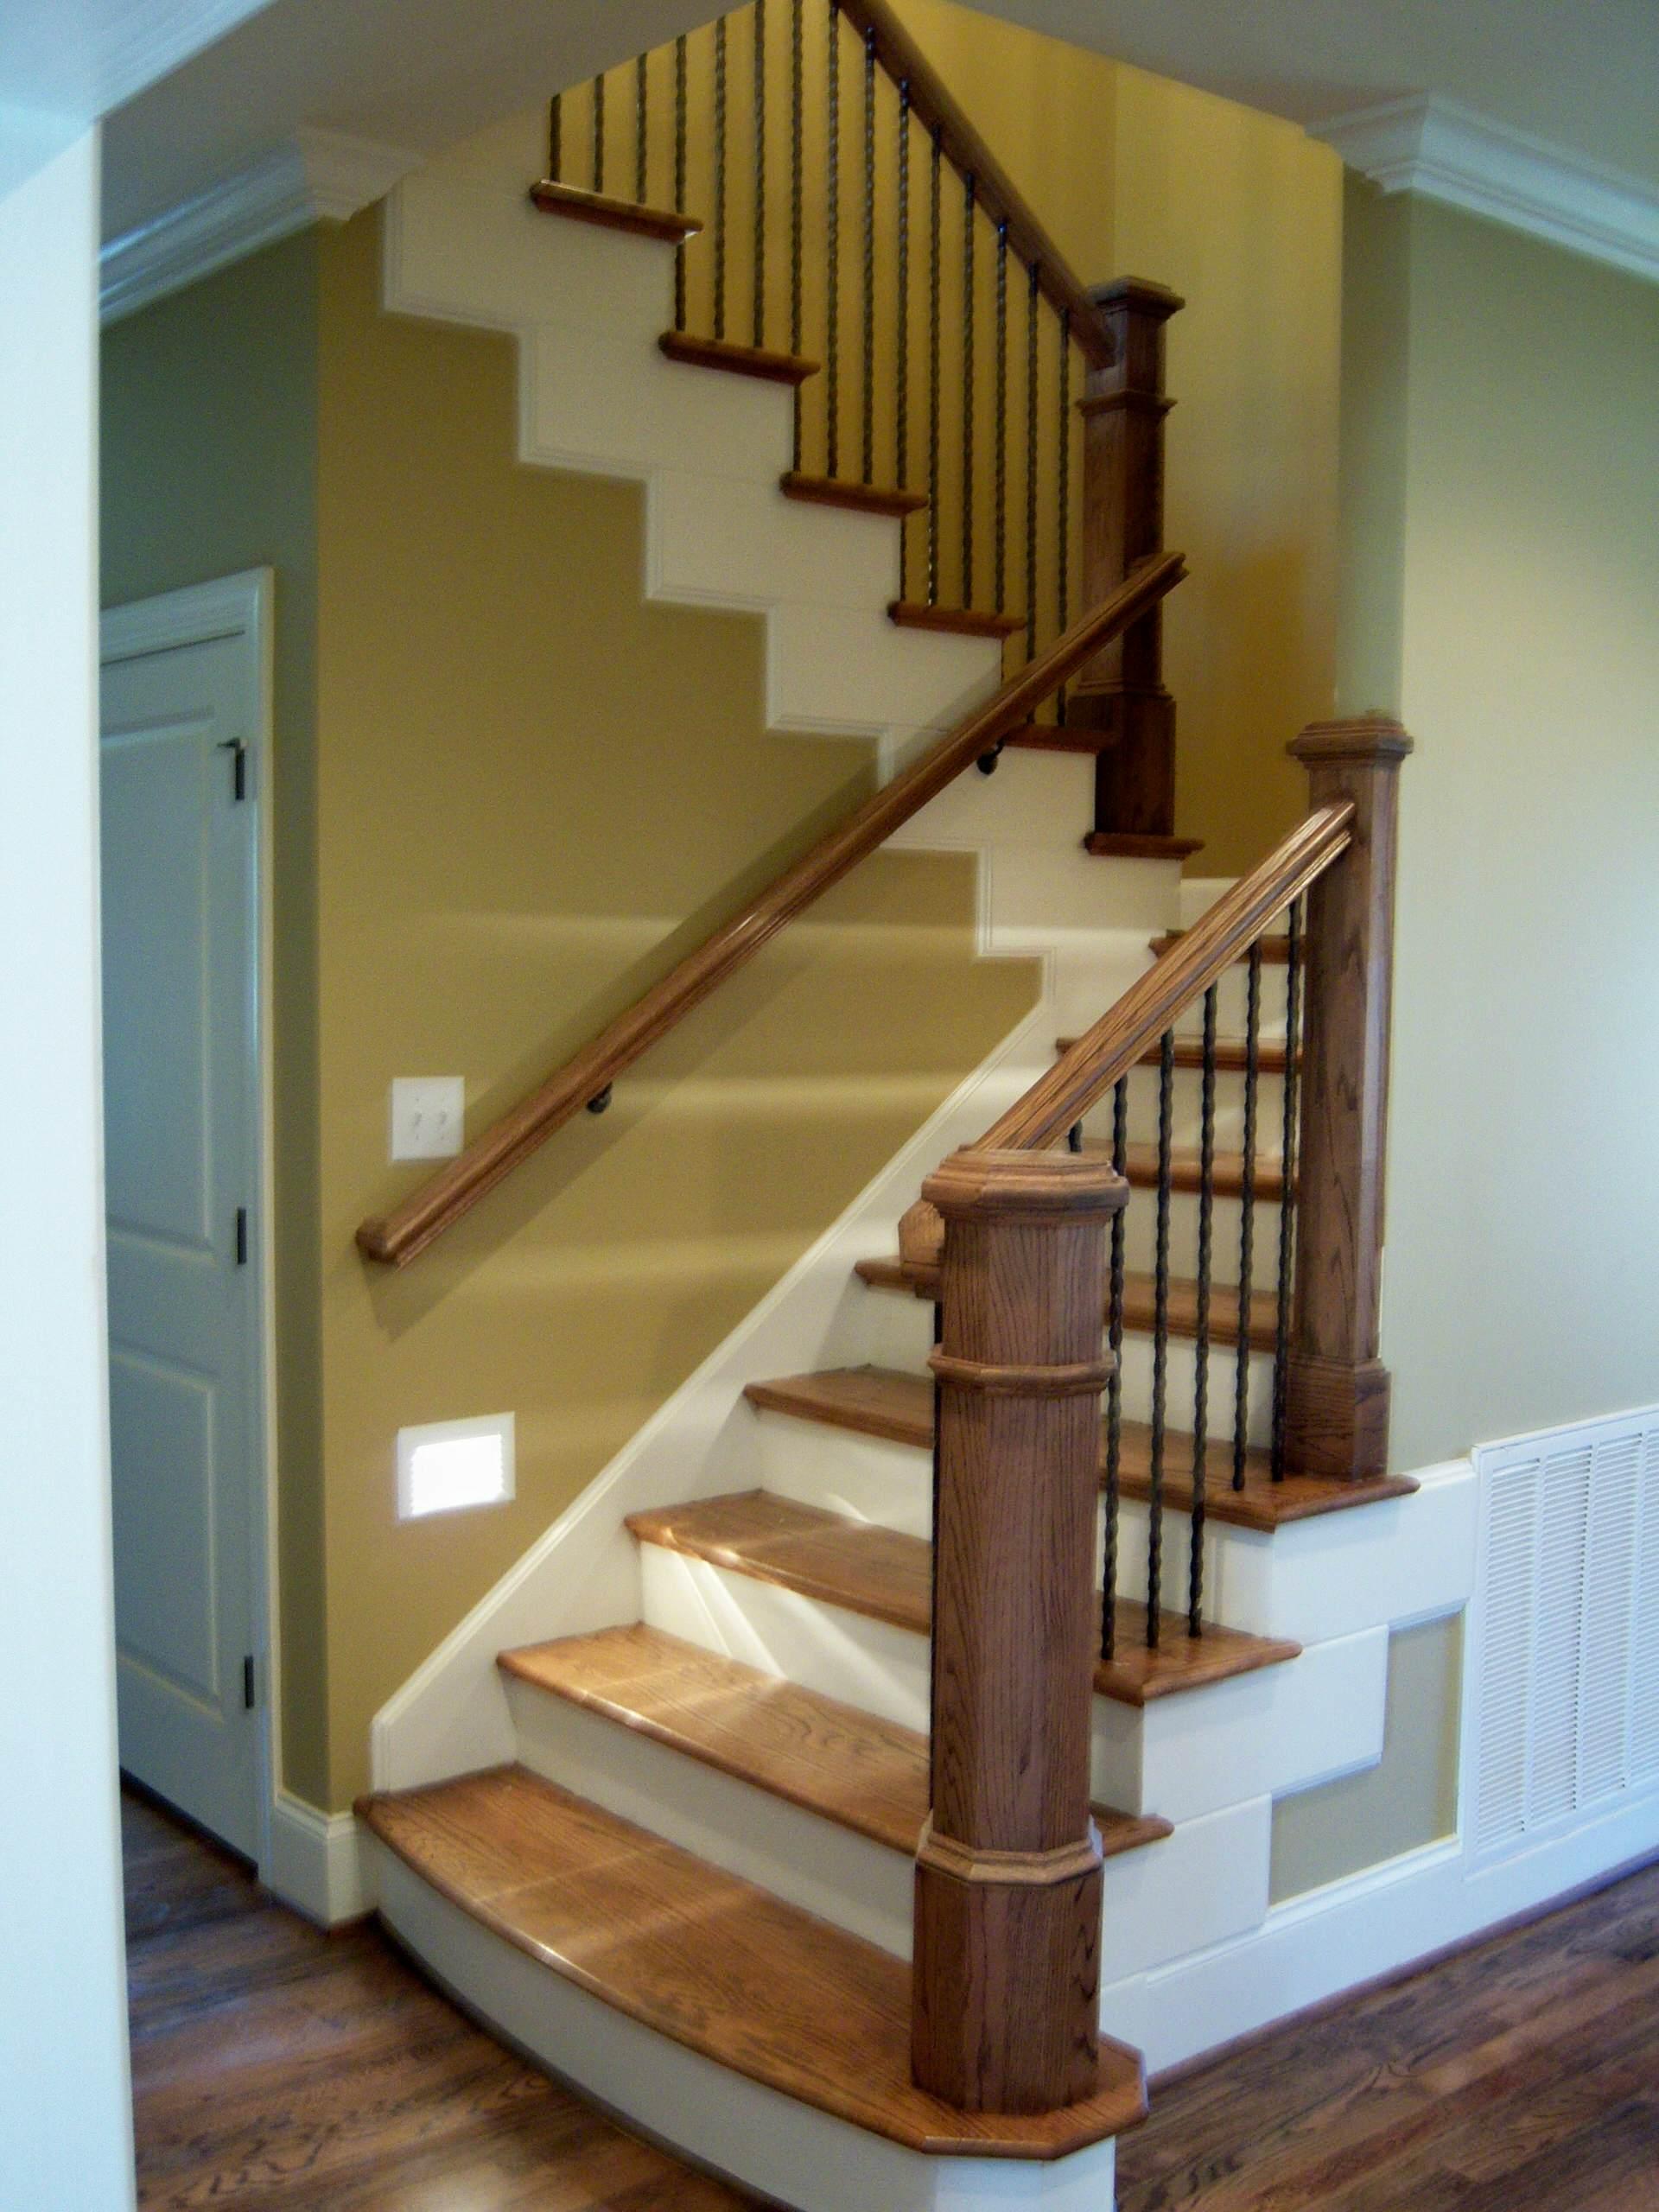 8x8 Tight Staircase